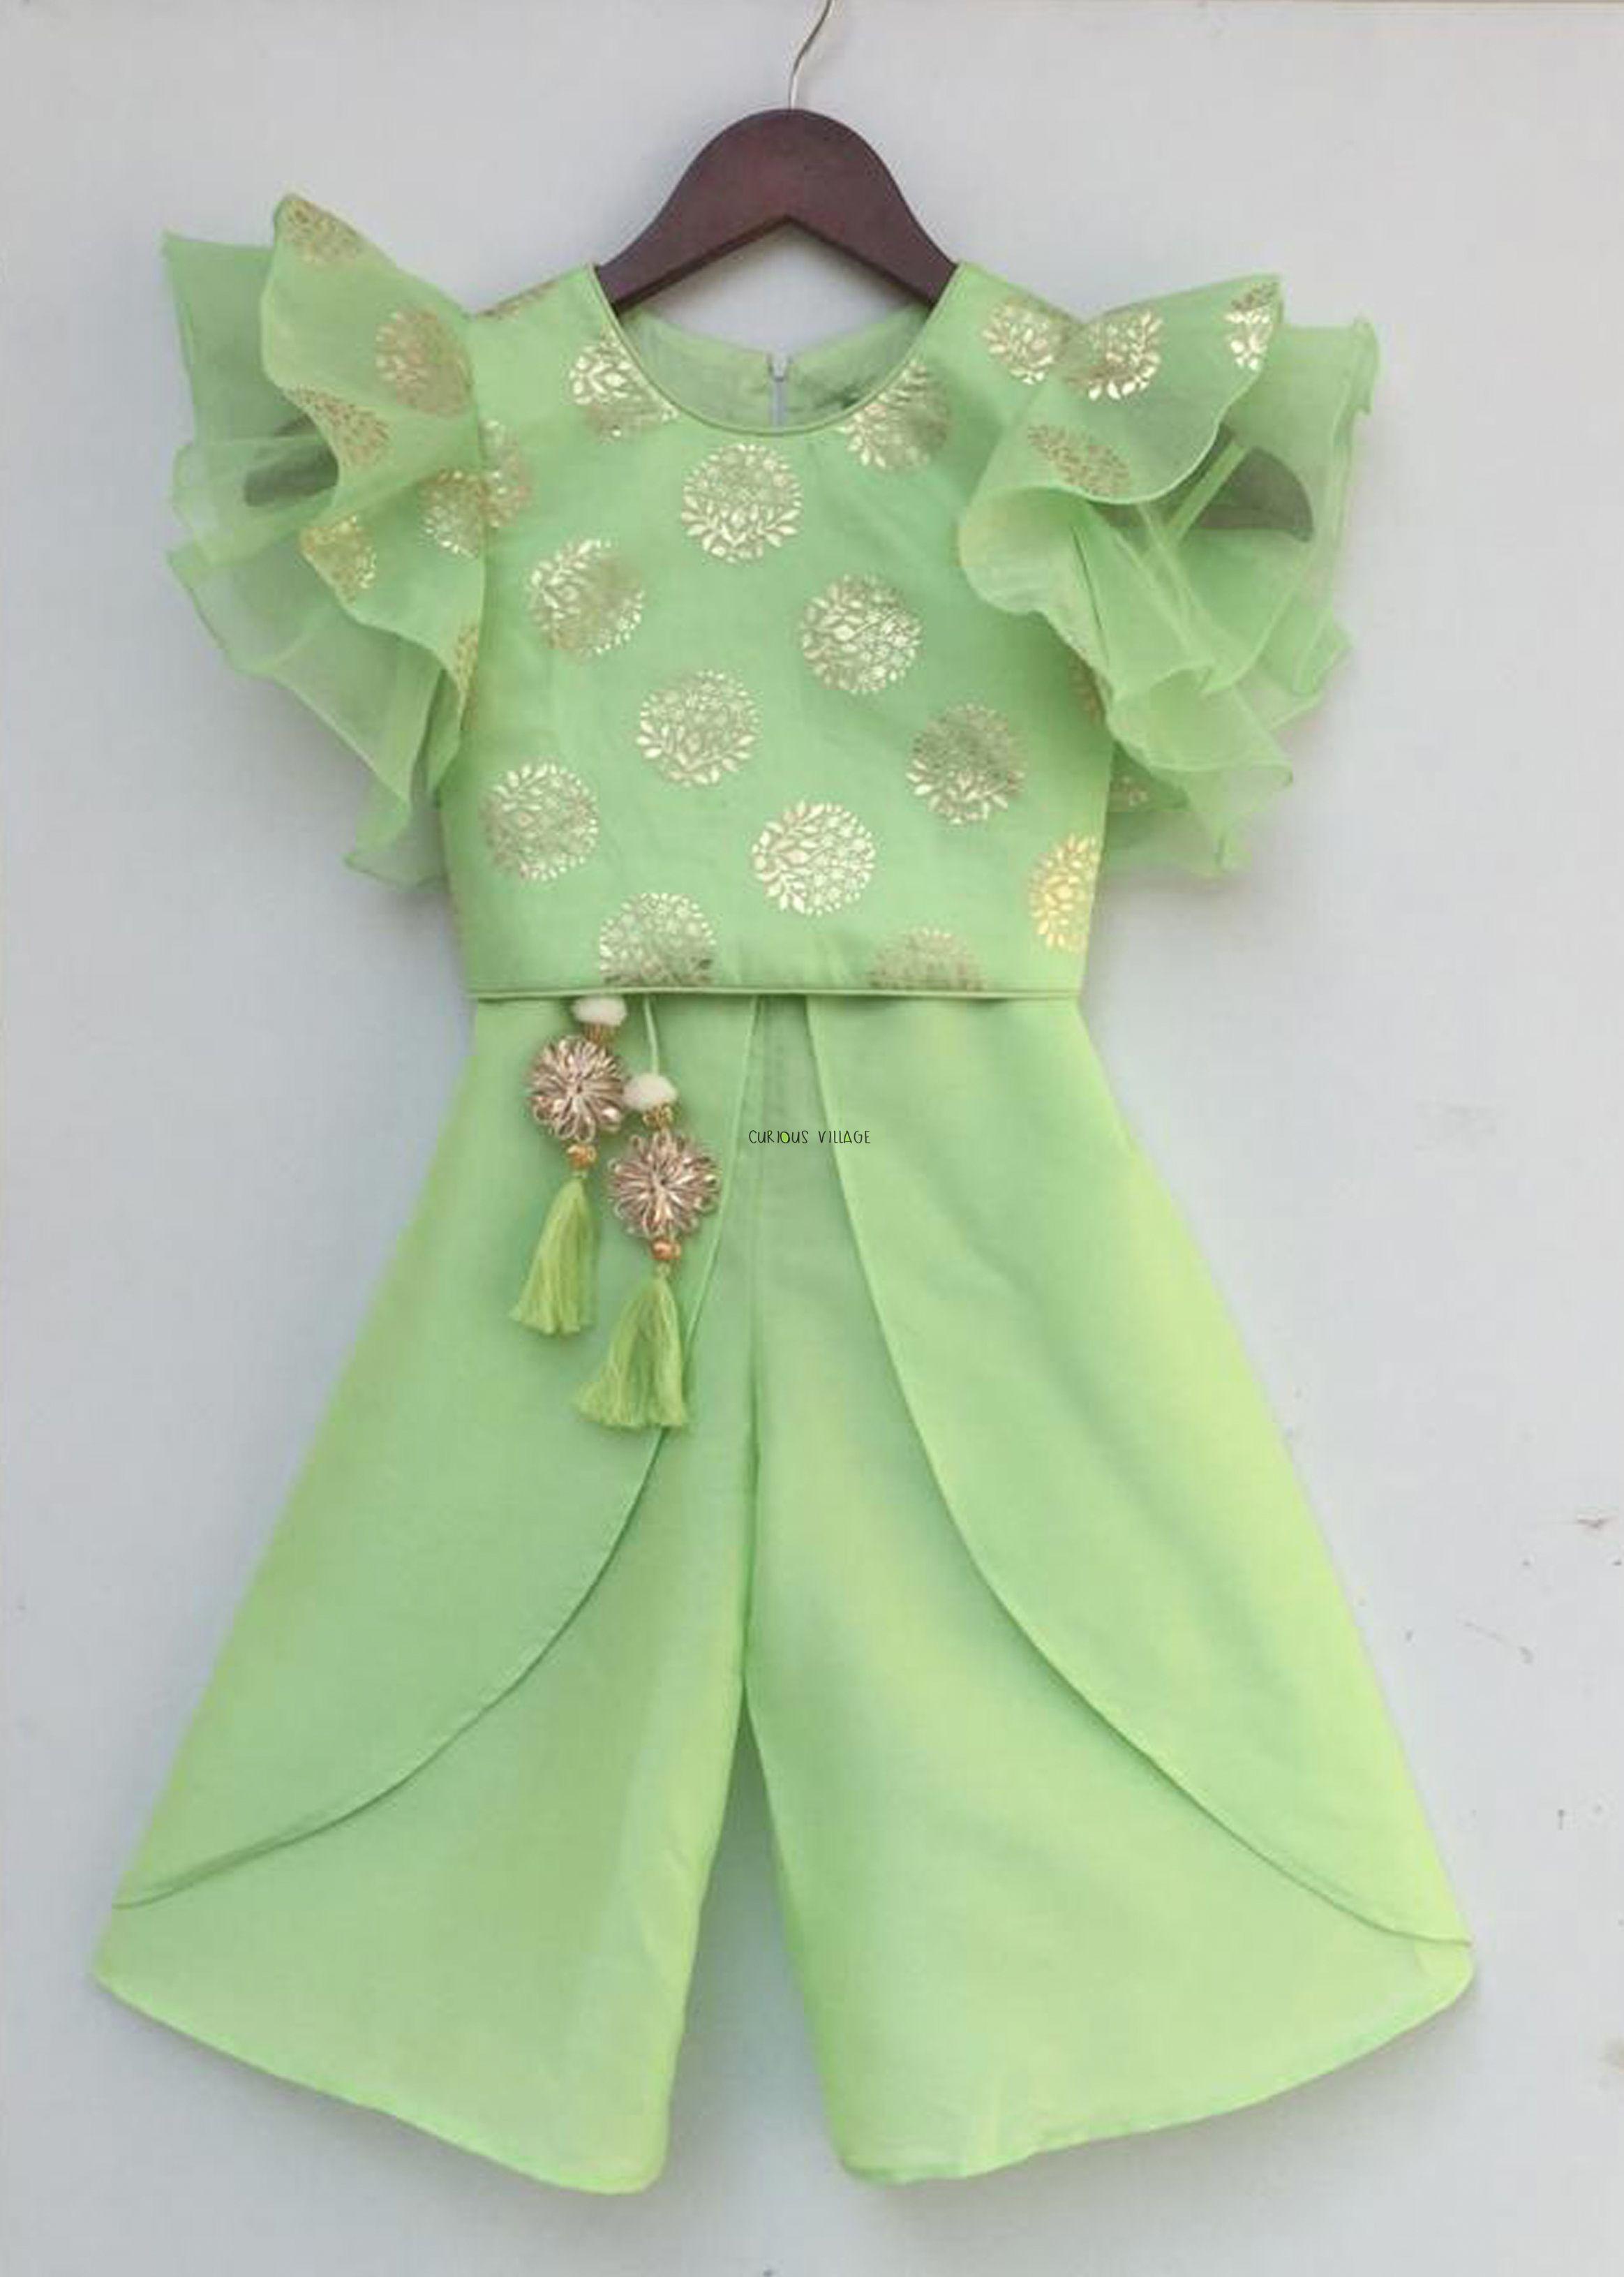 Green Foil Print Top with Plazo - Curious Village  Kids designer